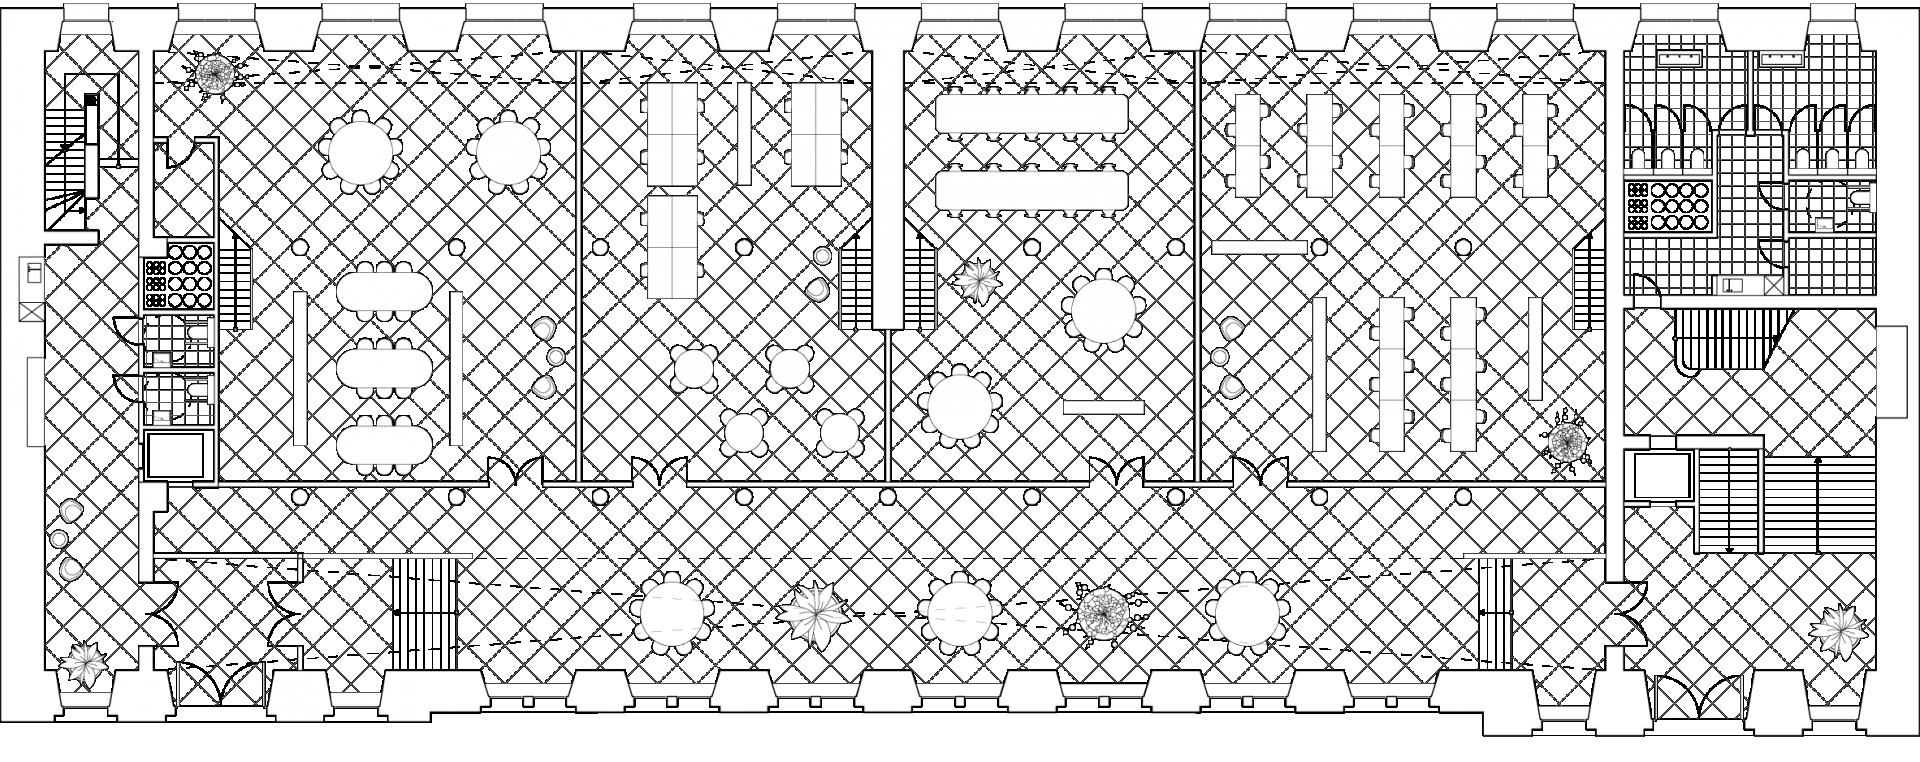 Lebeau Plan Paille1